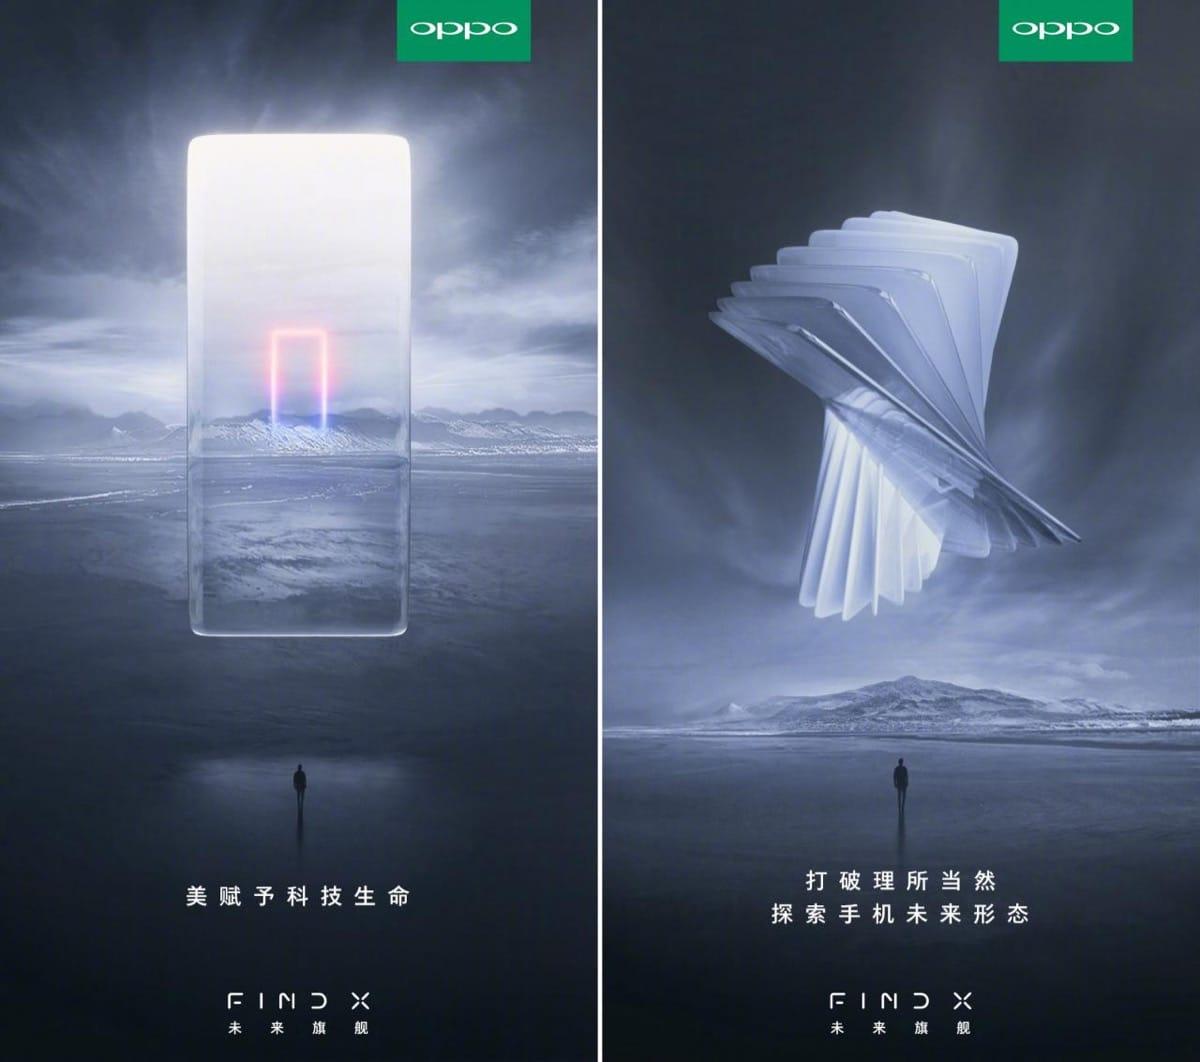 Дисплей Oppo Find Xзанимает 93,8% площади лицевой панели— Новый рекорд